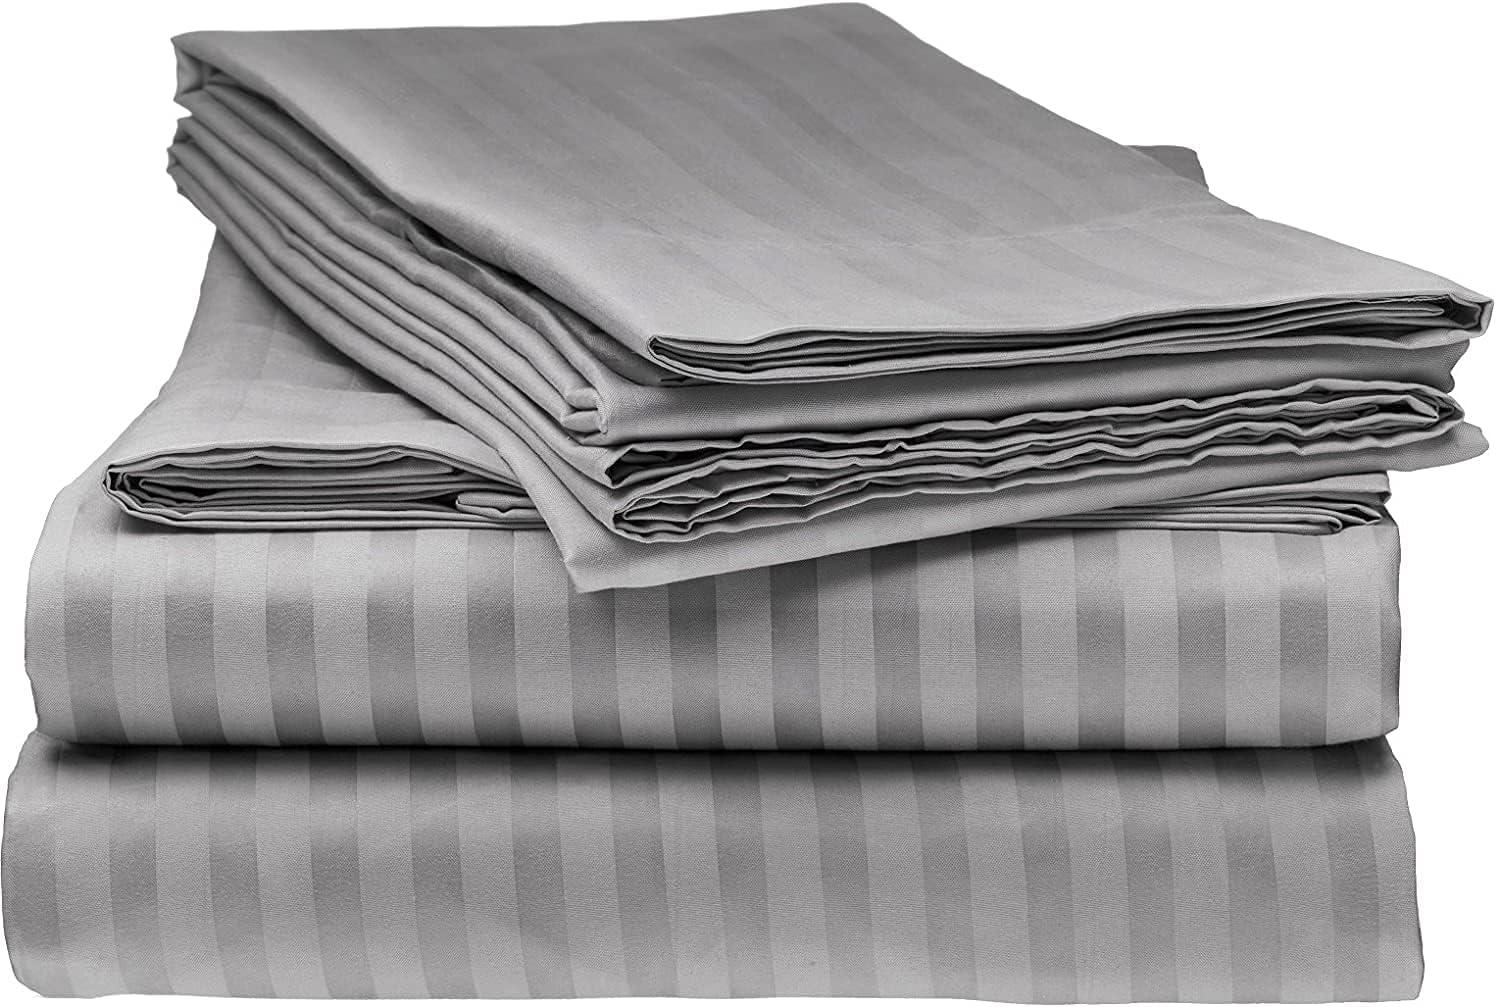 Discount mail order 4PC Sheet Set Stripe 800 Thread Cotton - Fi 100% Count Egyptian Ranking TOP19